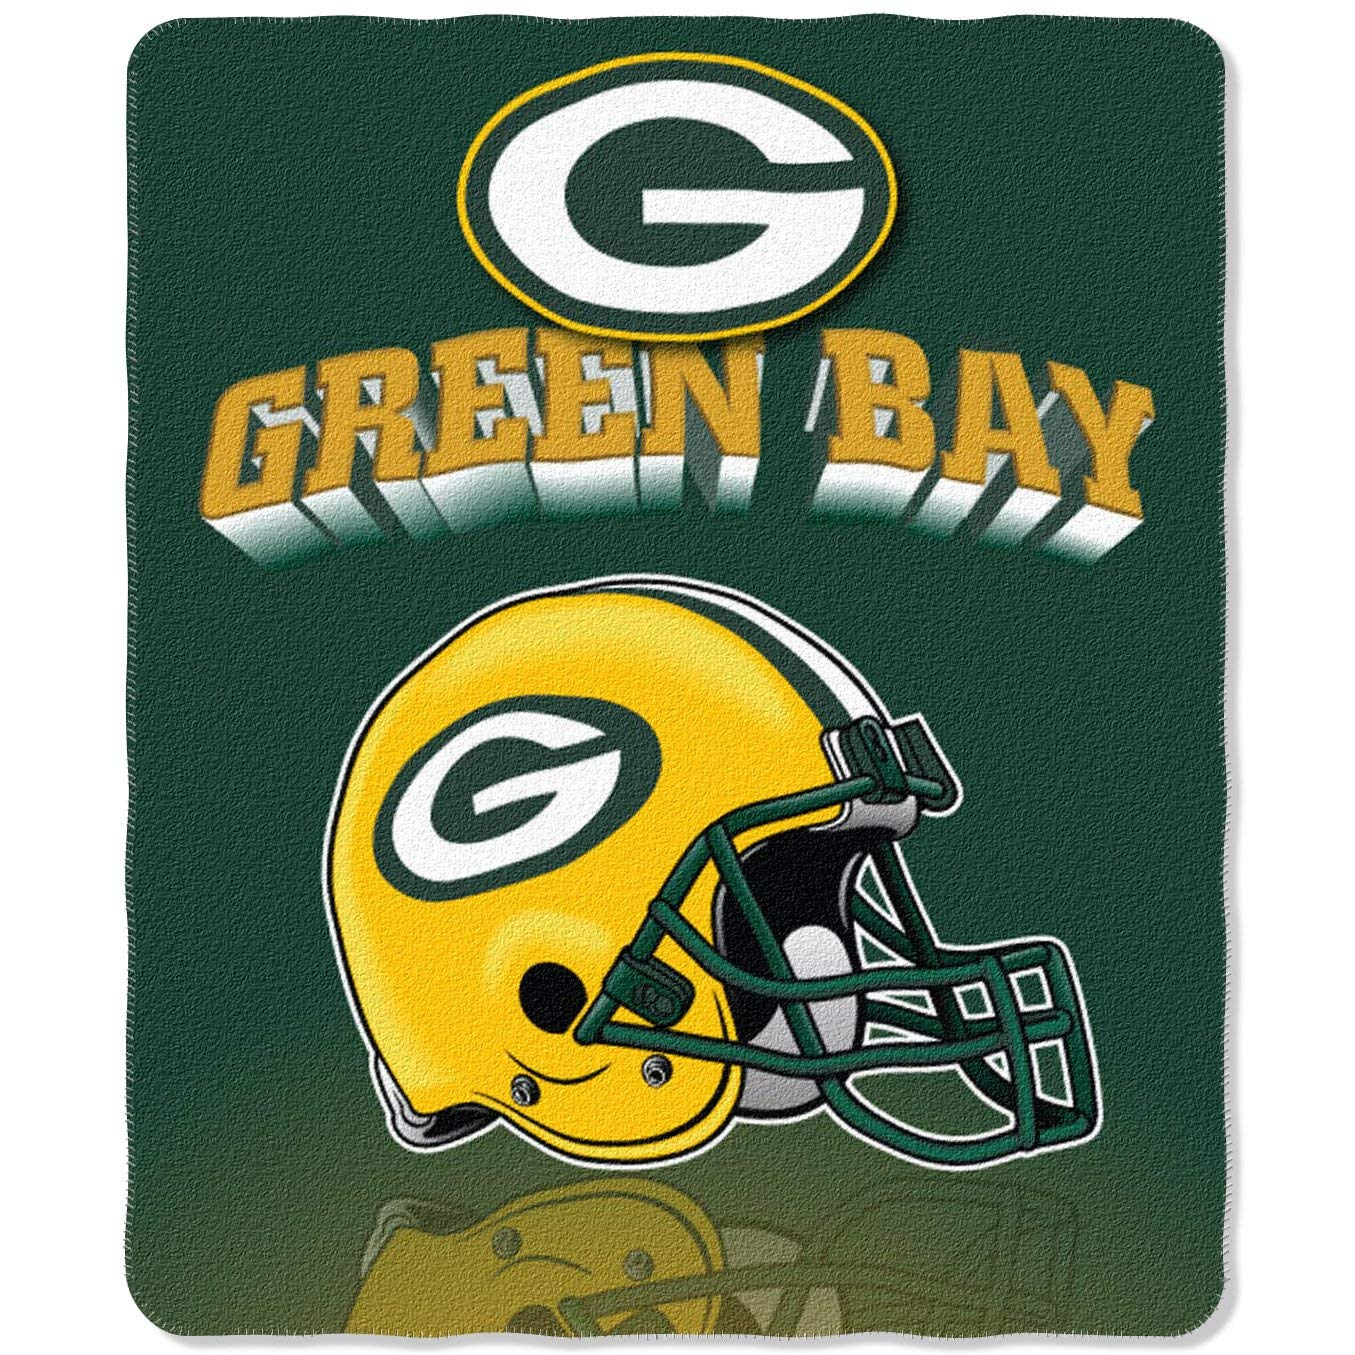 SLW Green Bay Packers Fleece Throw Blanket 50X60